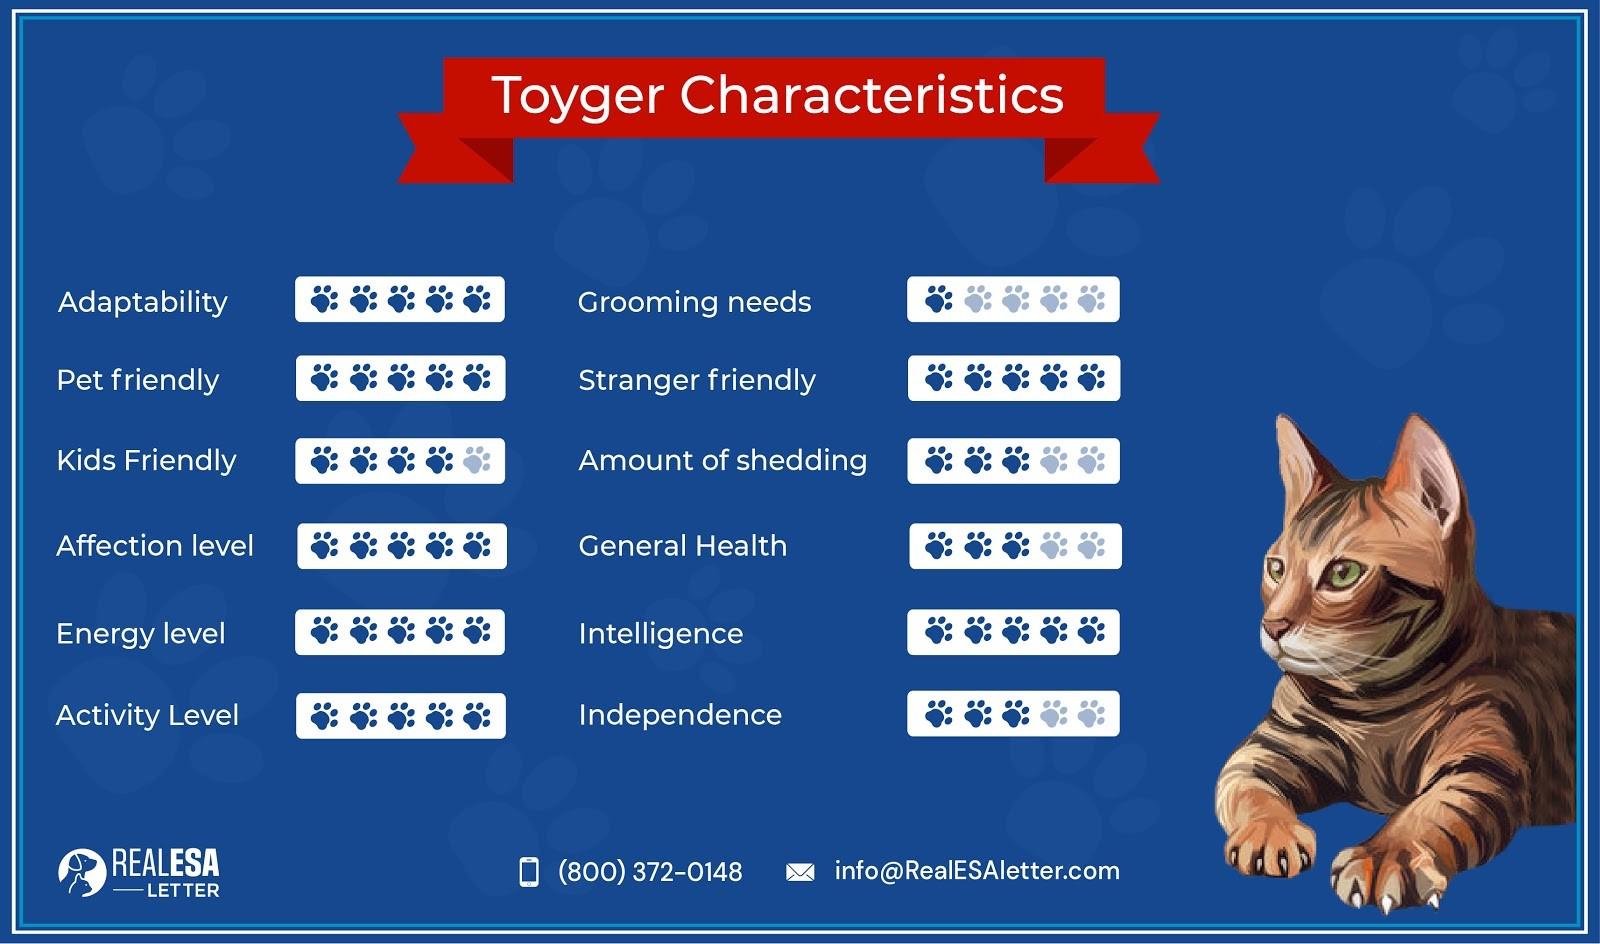 Toyger Characteristics